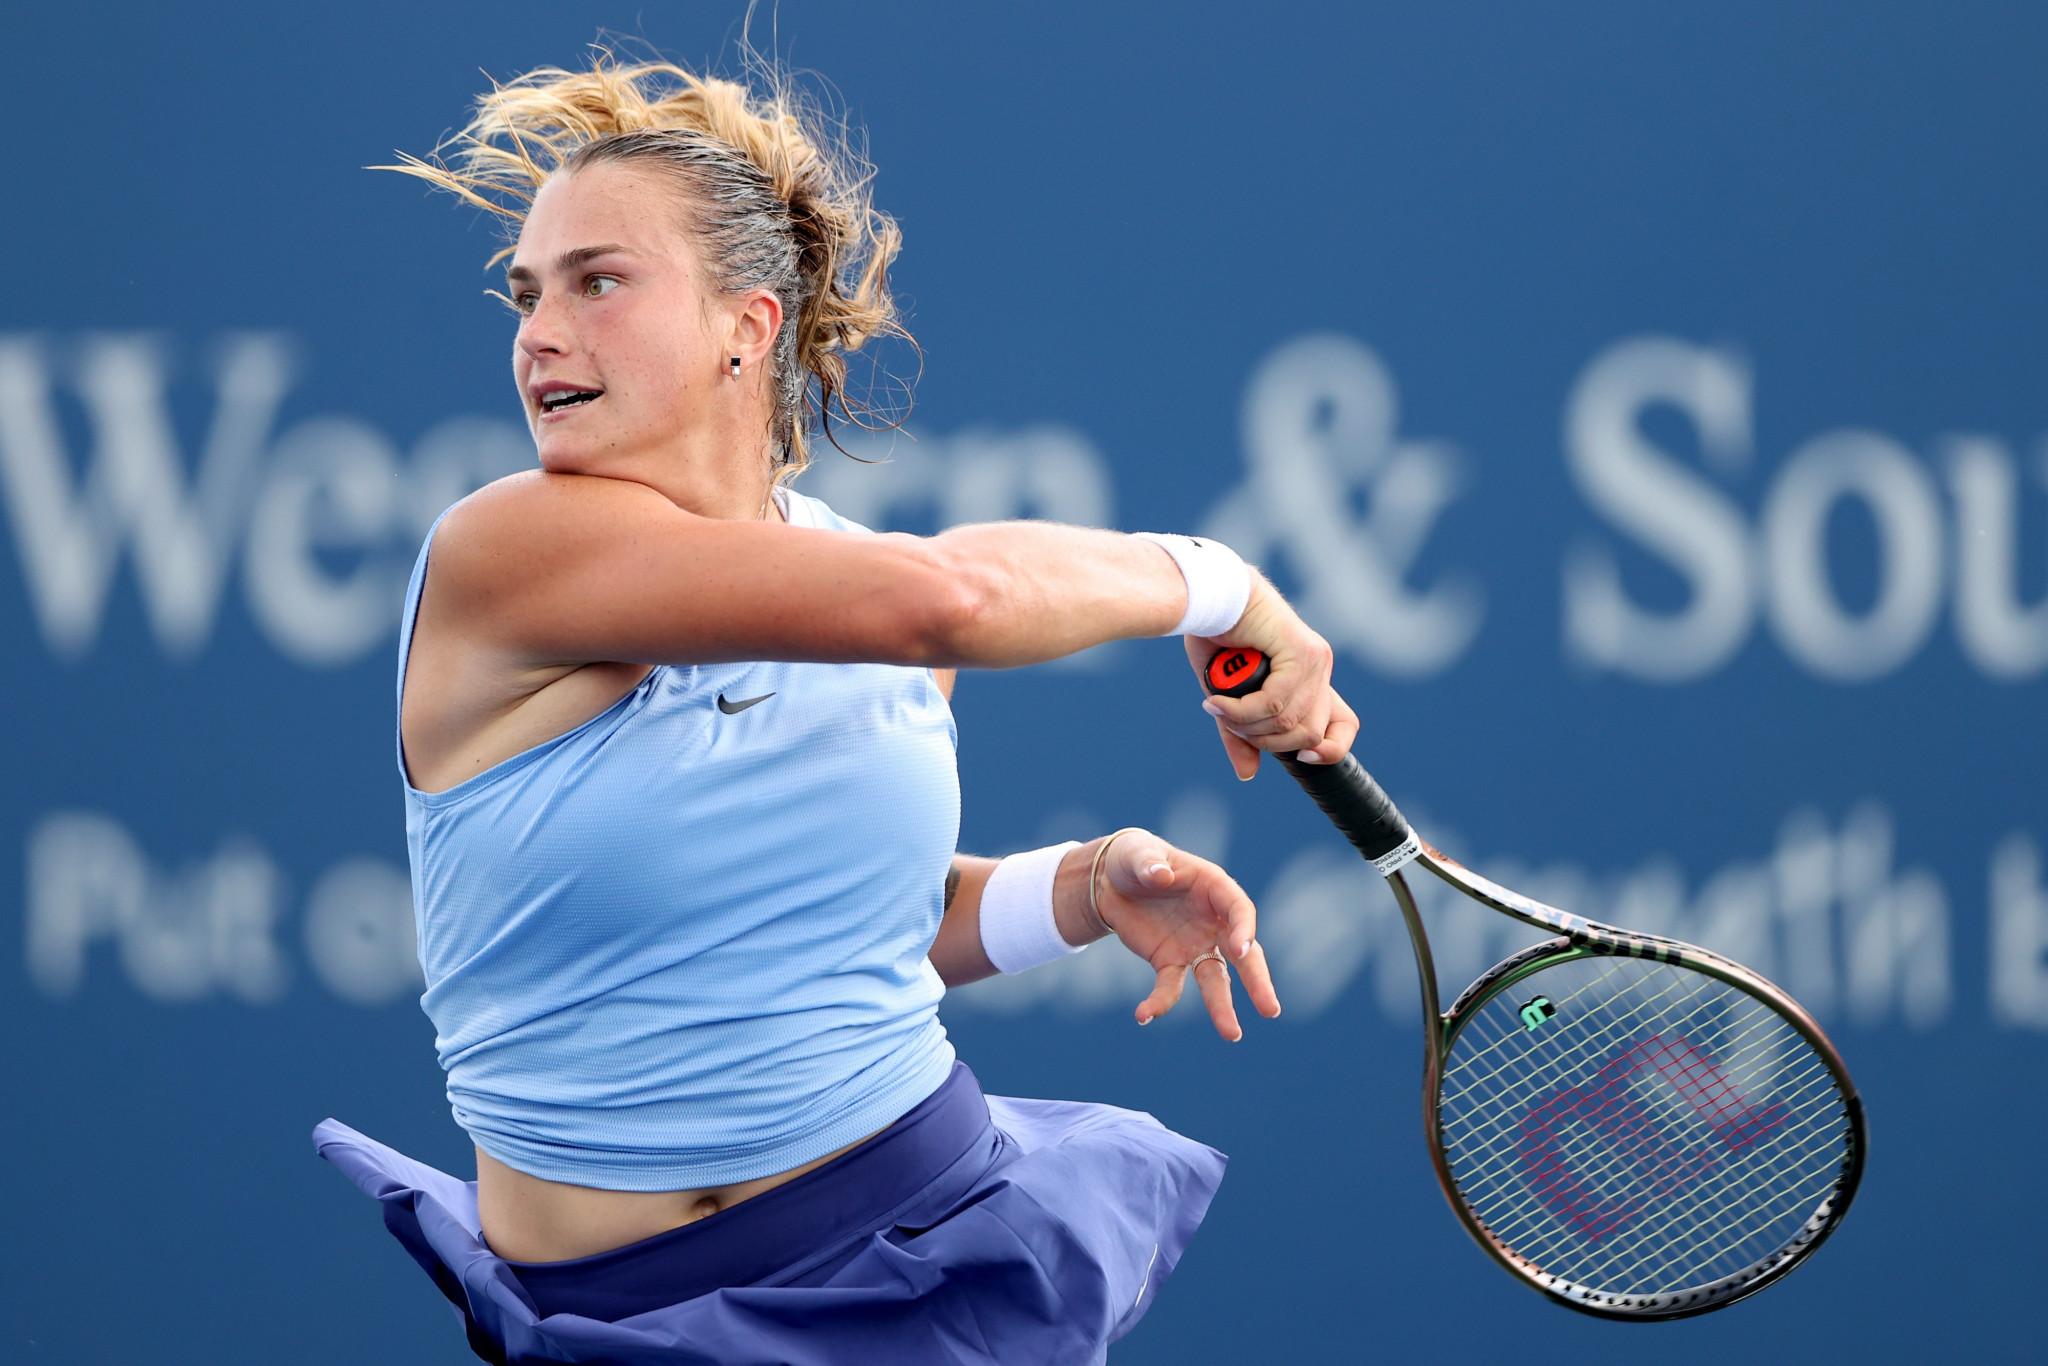 Aryna Sabalenka suffered a three-set defeat to Paula Badosa ©Getty Images